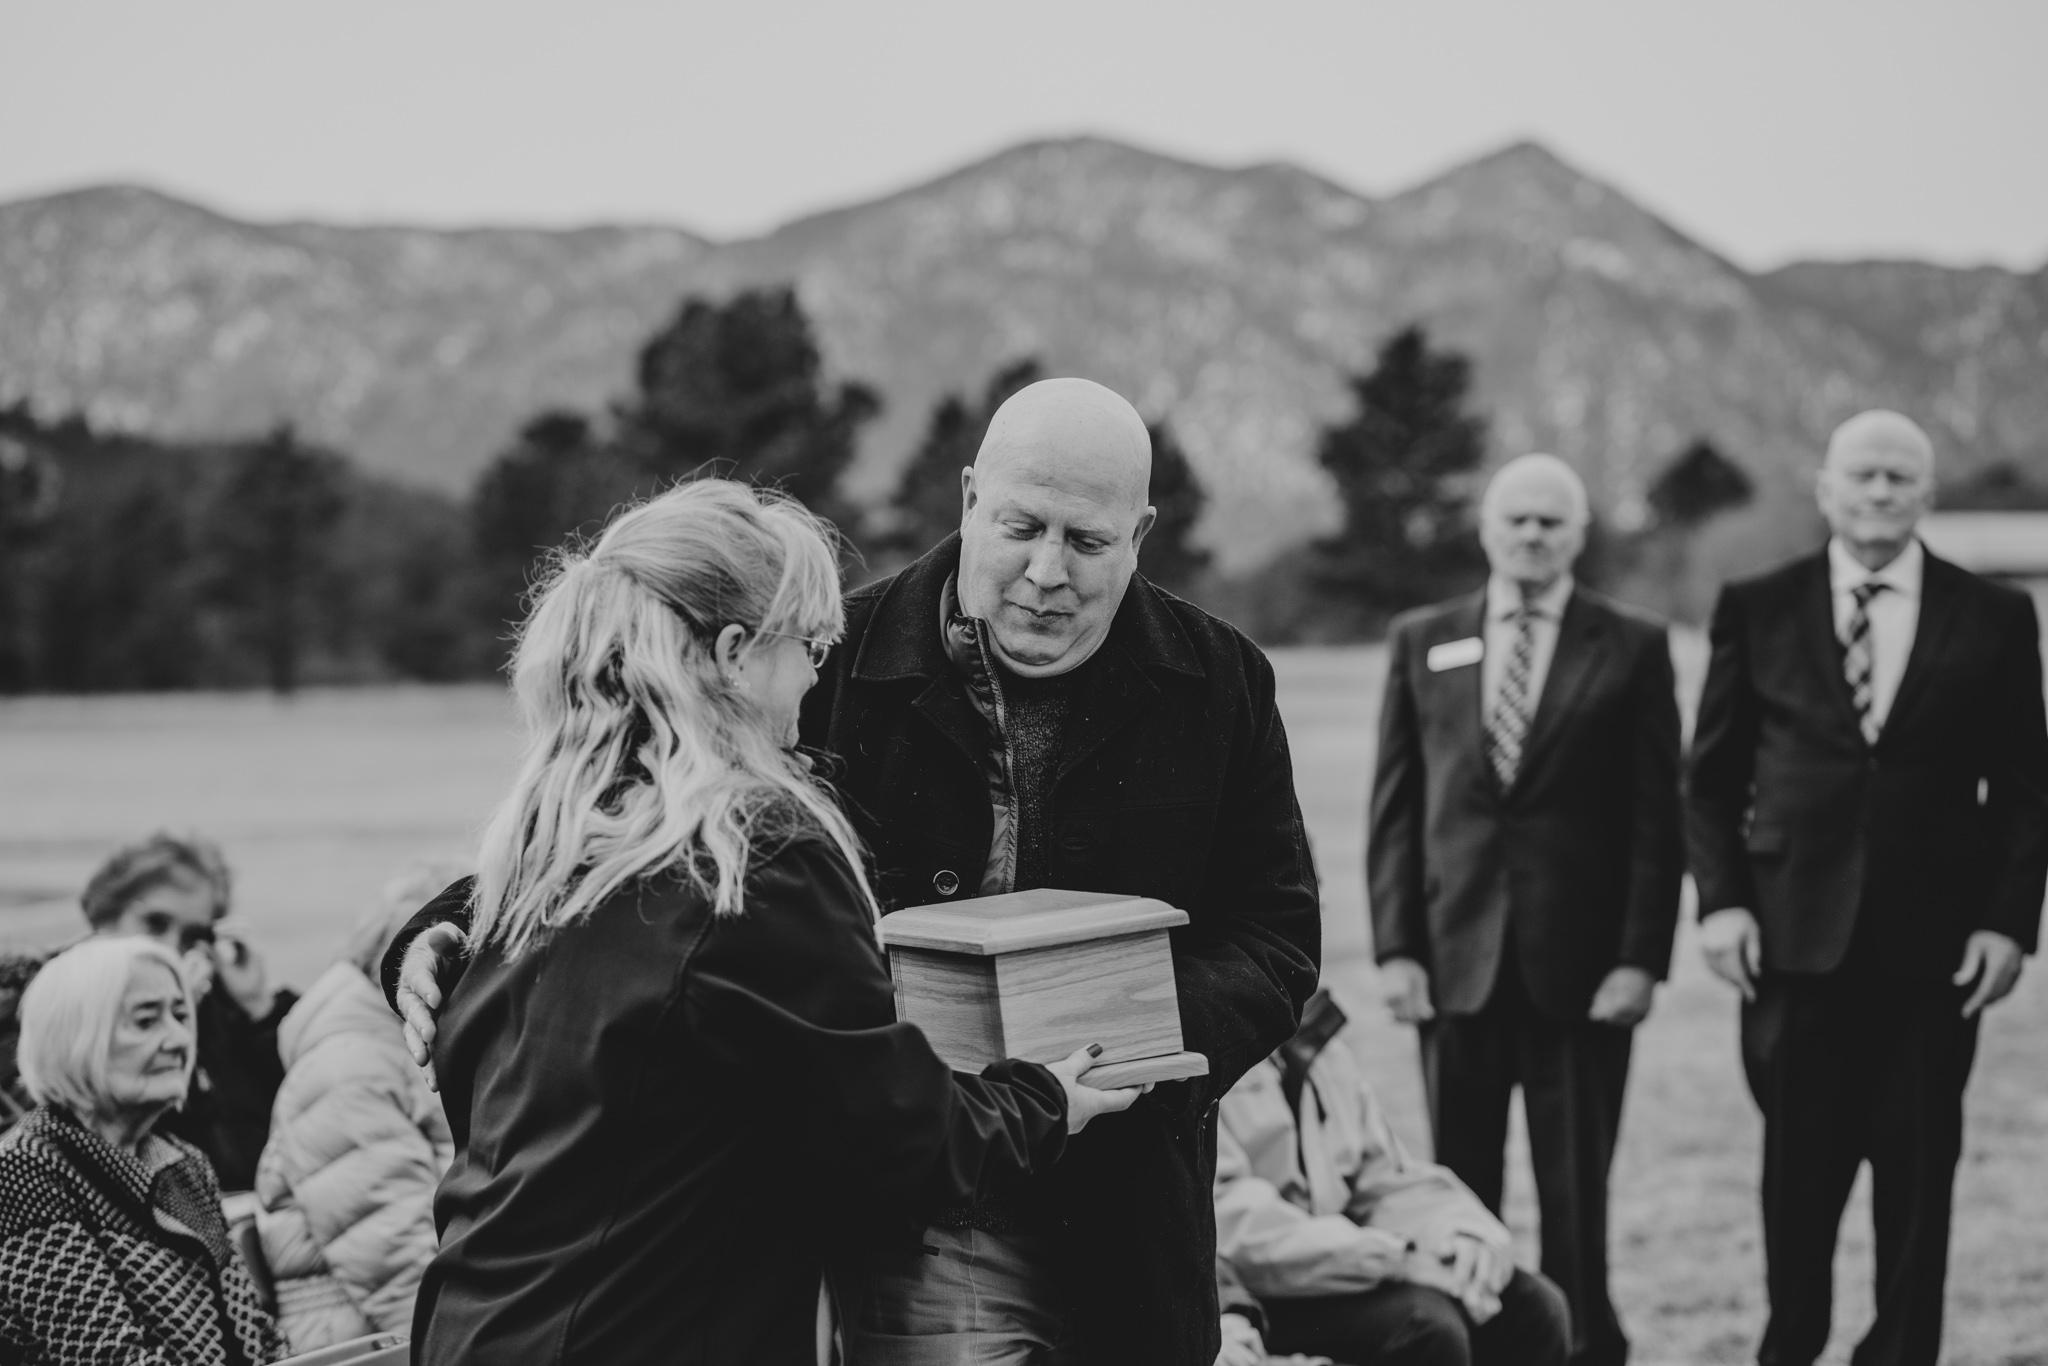 usafa-colorado-military-honours-burial-funeral-photography-grace-elizabeth-colchester-essex-alternative-wedding-lifestyle-photographer (92 of 127).jpg